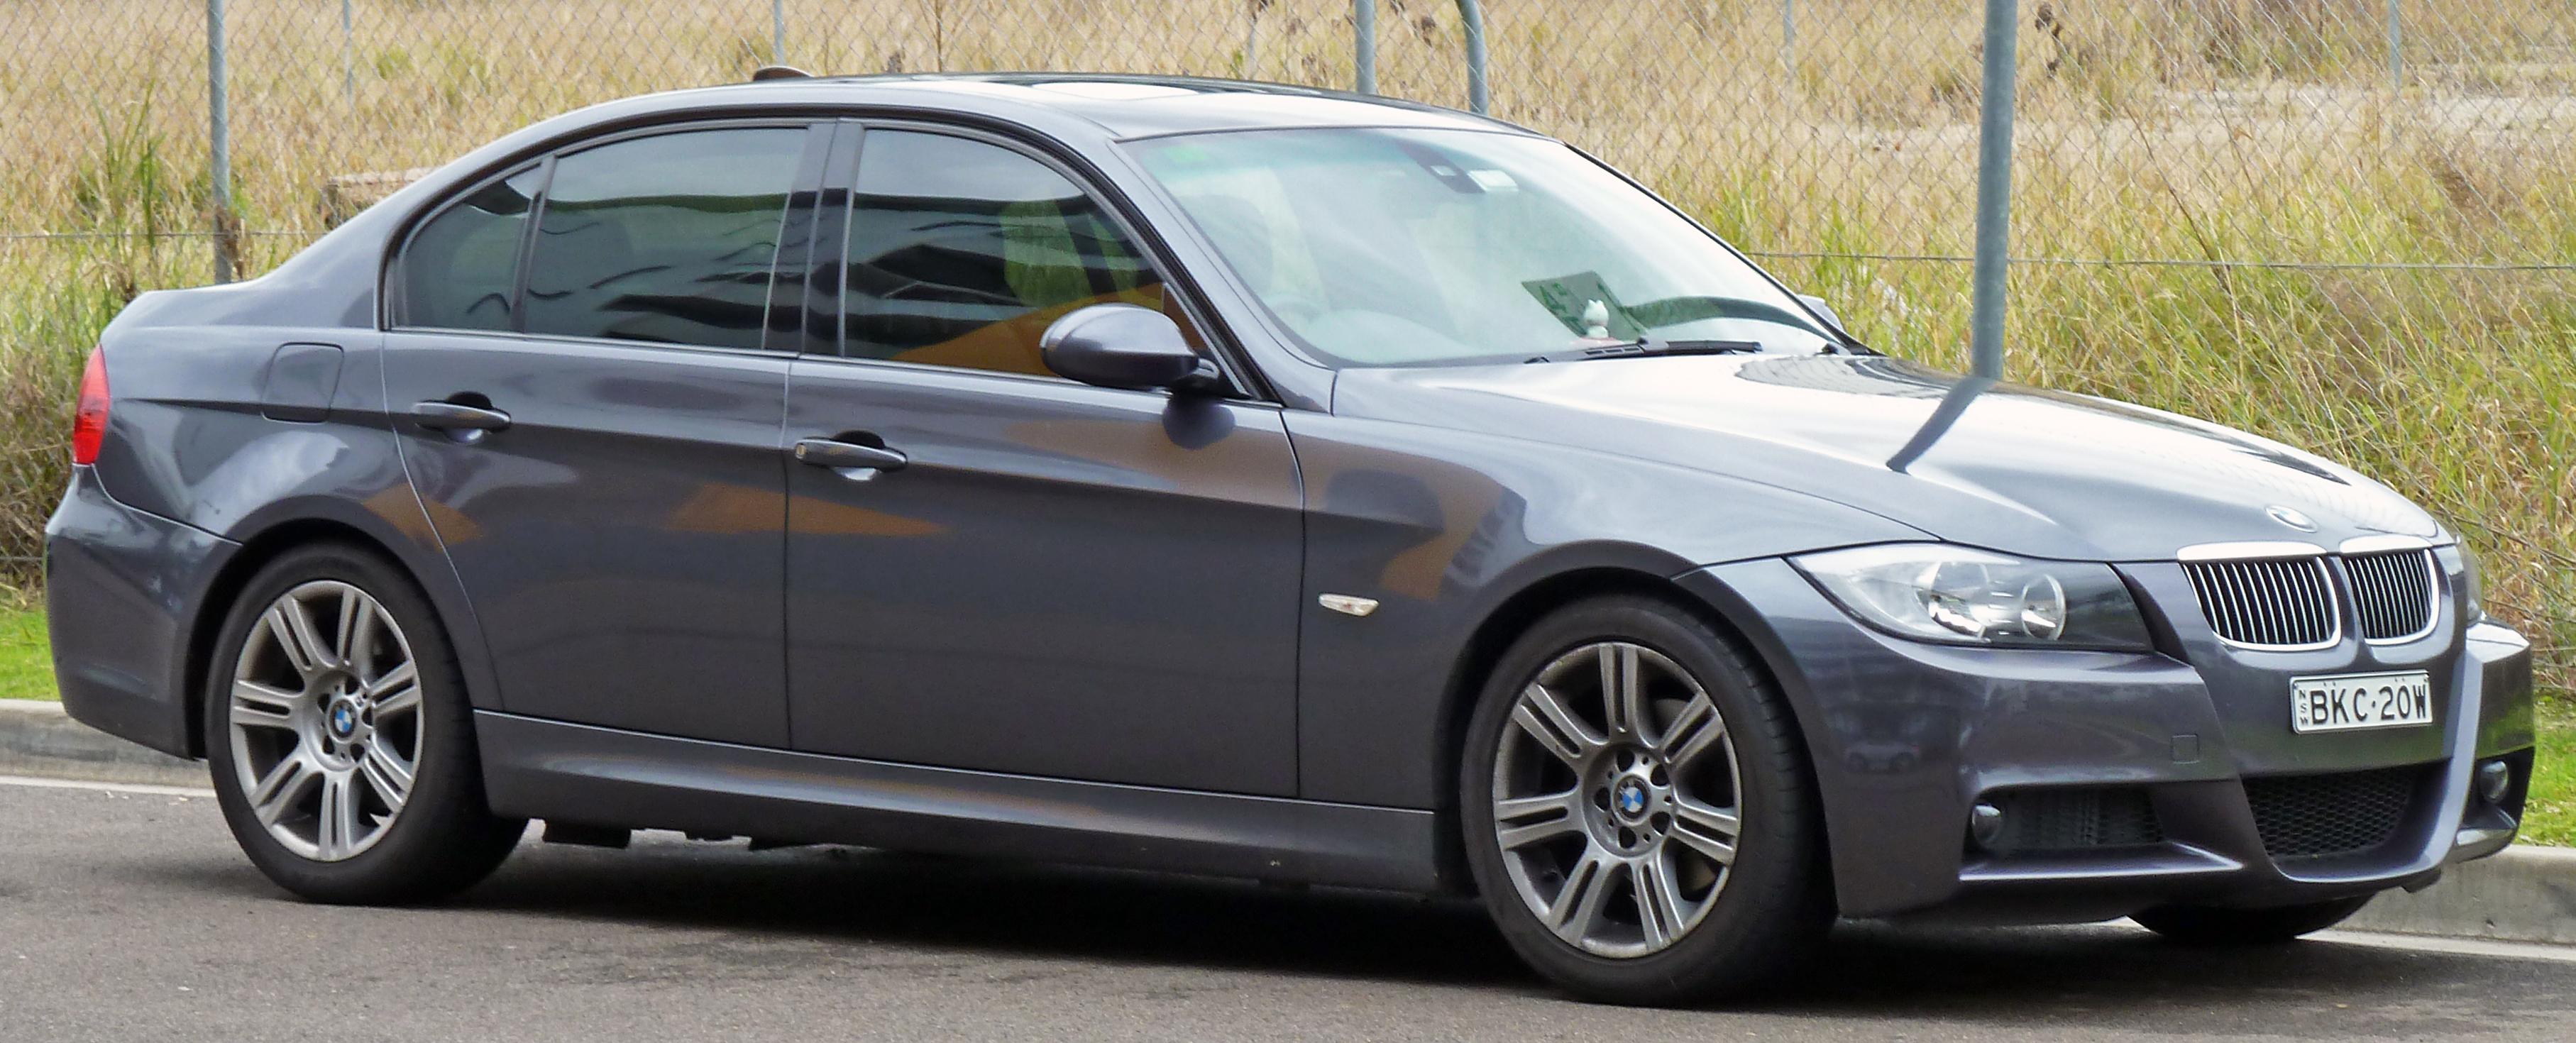 Bmw E90 Wiki >> File:2005-2008 BMW 325i (E90) sedan 02.jpg - Wikimedia Commons